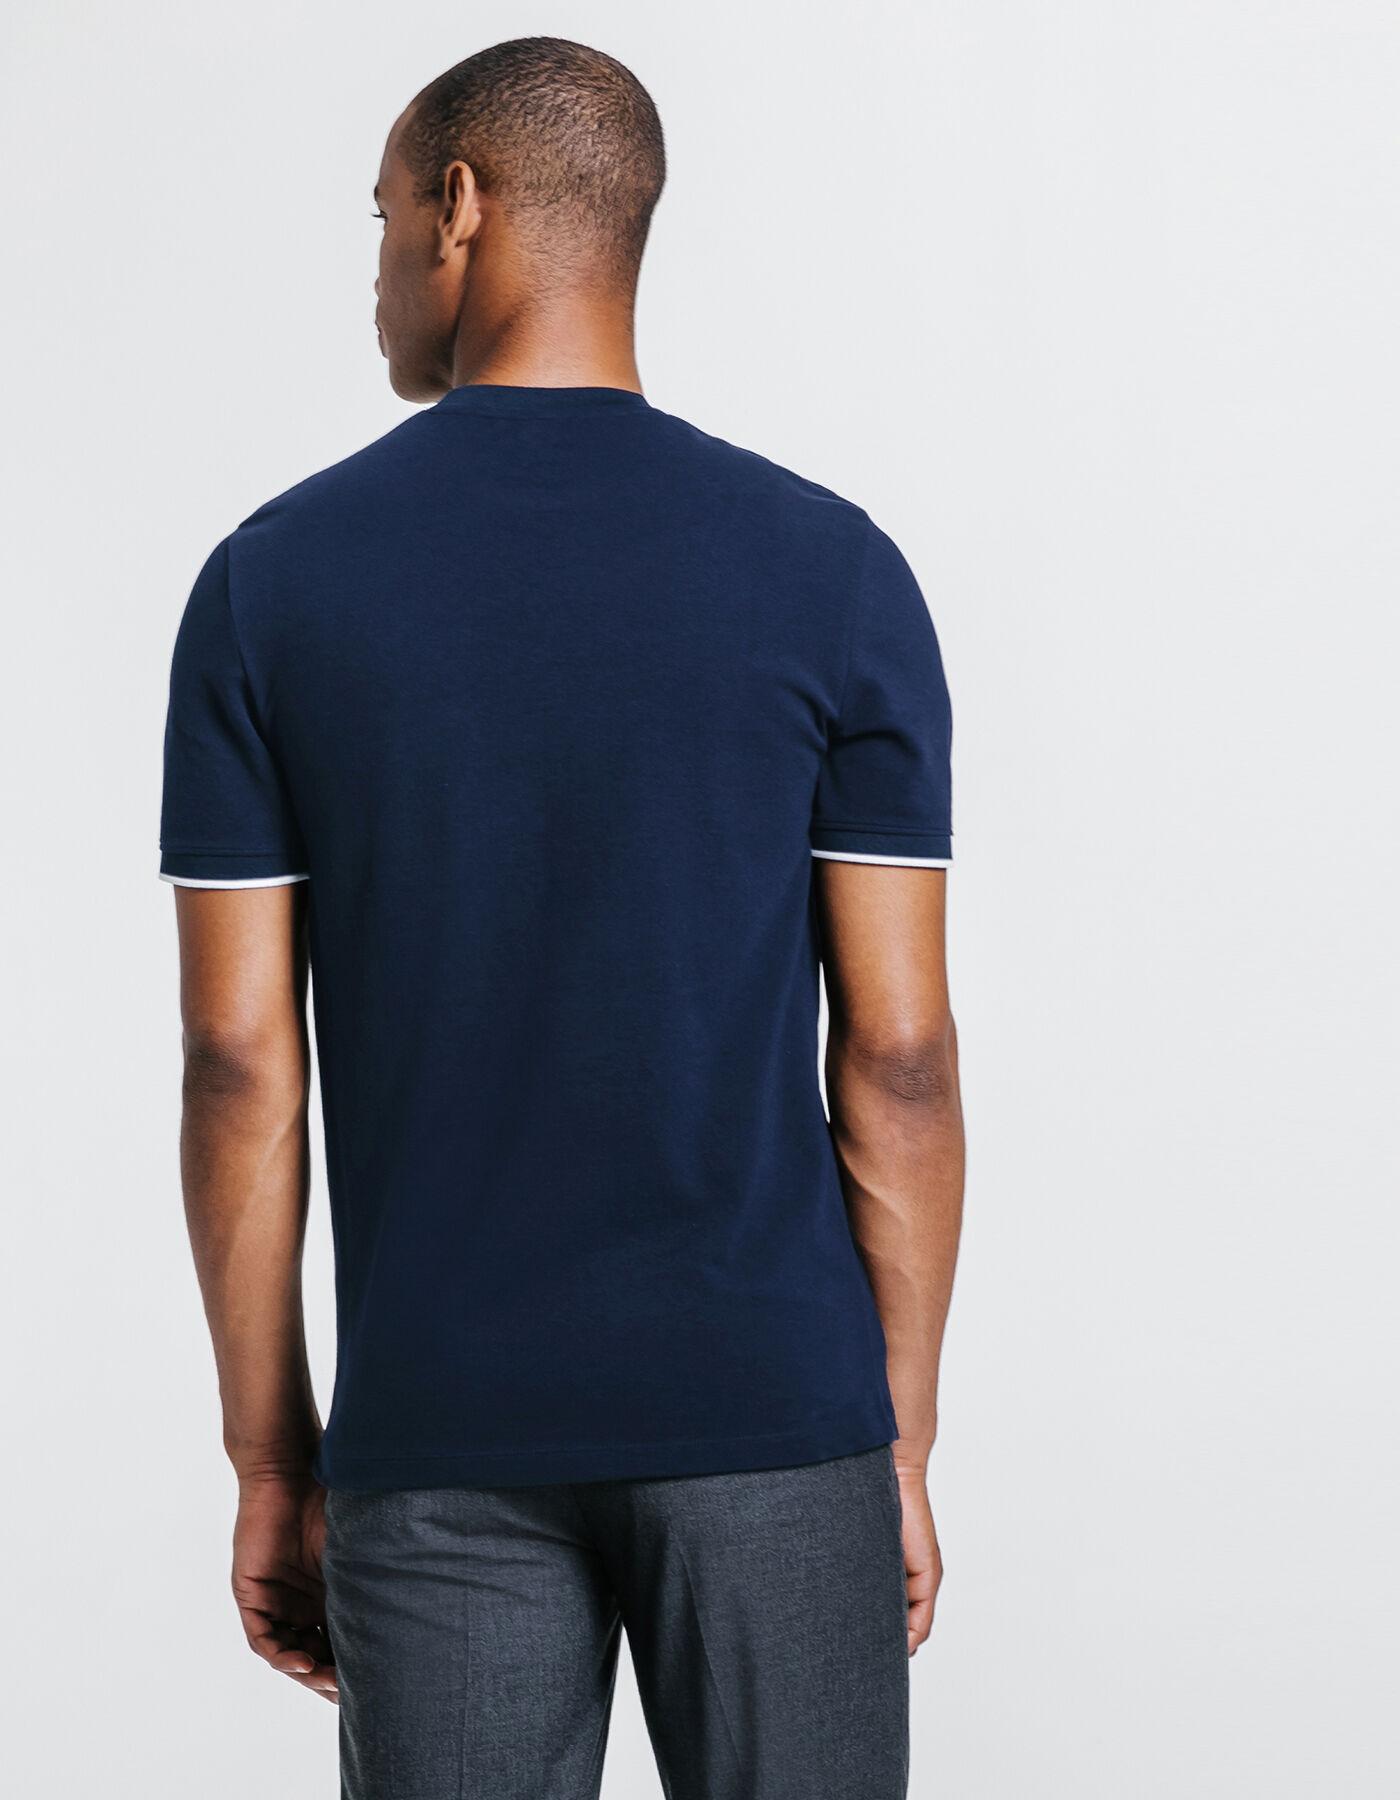 96bba53c55b92d Tee shirt col rond uni poche poitrine Bleu Marine Homme